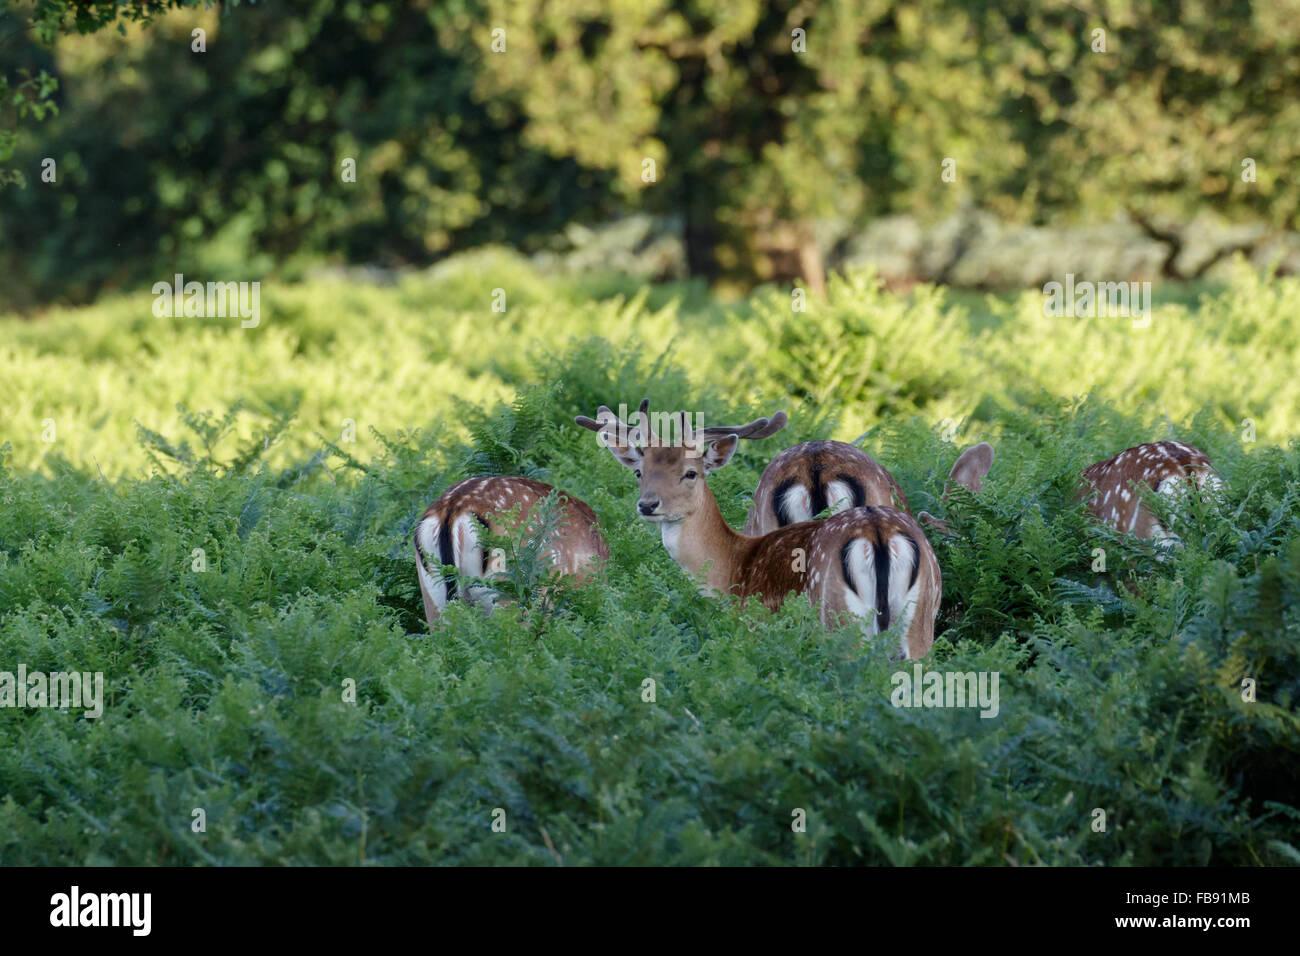 Fallow Deer (Dama dama) foraging among the ferns. - Stock Image